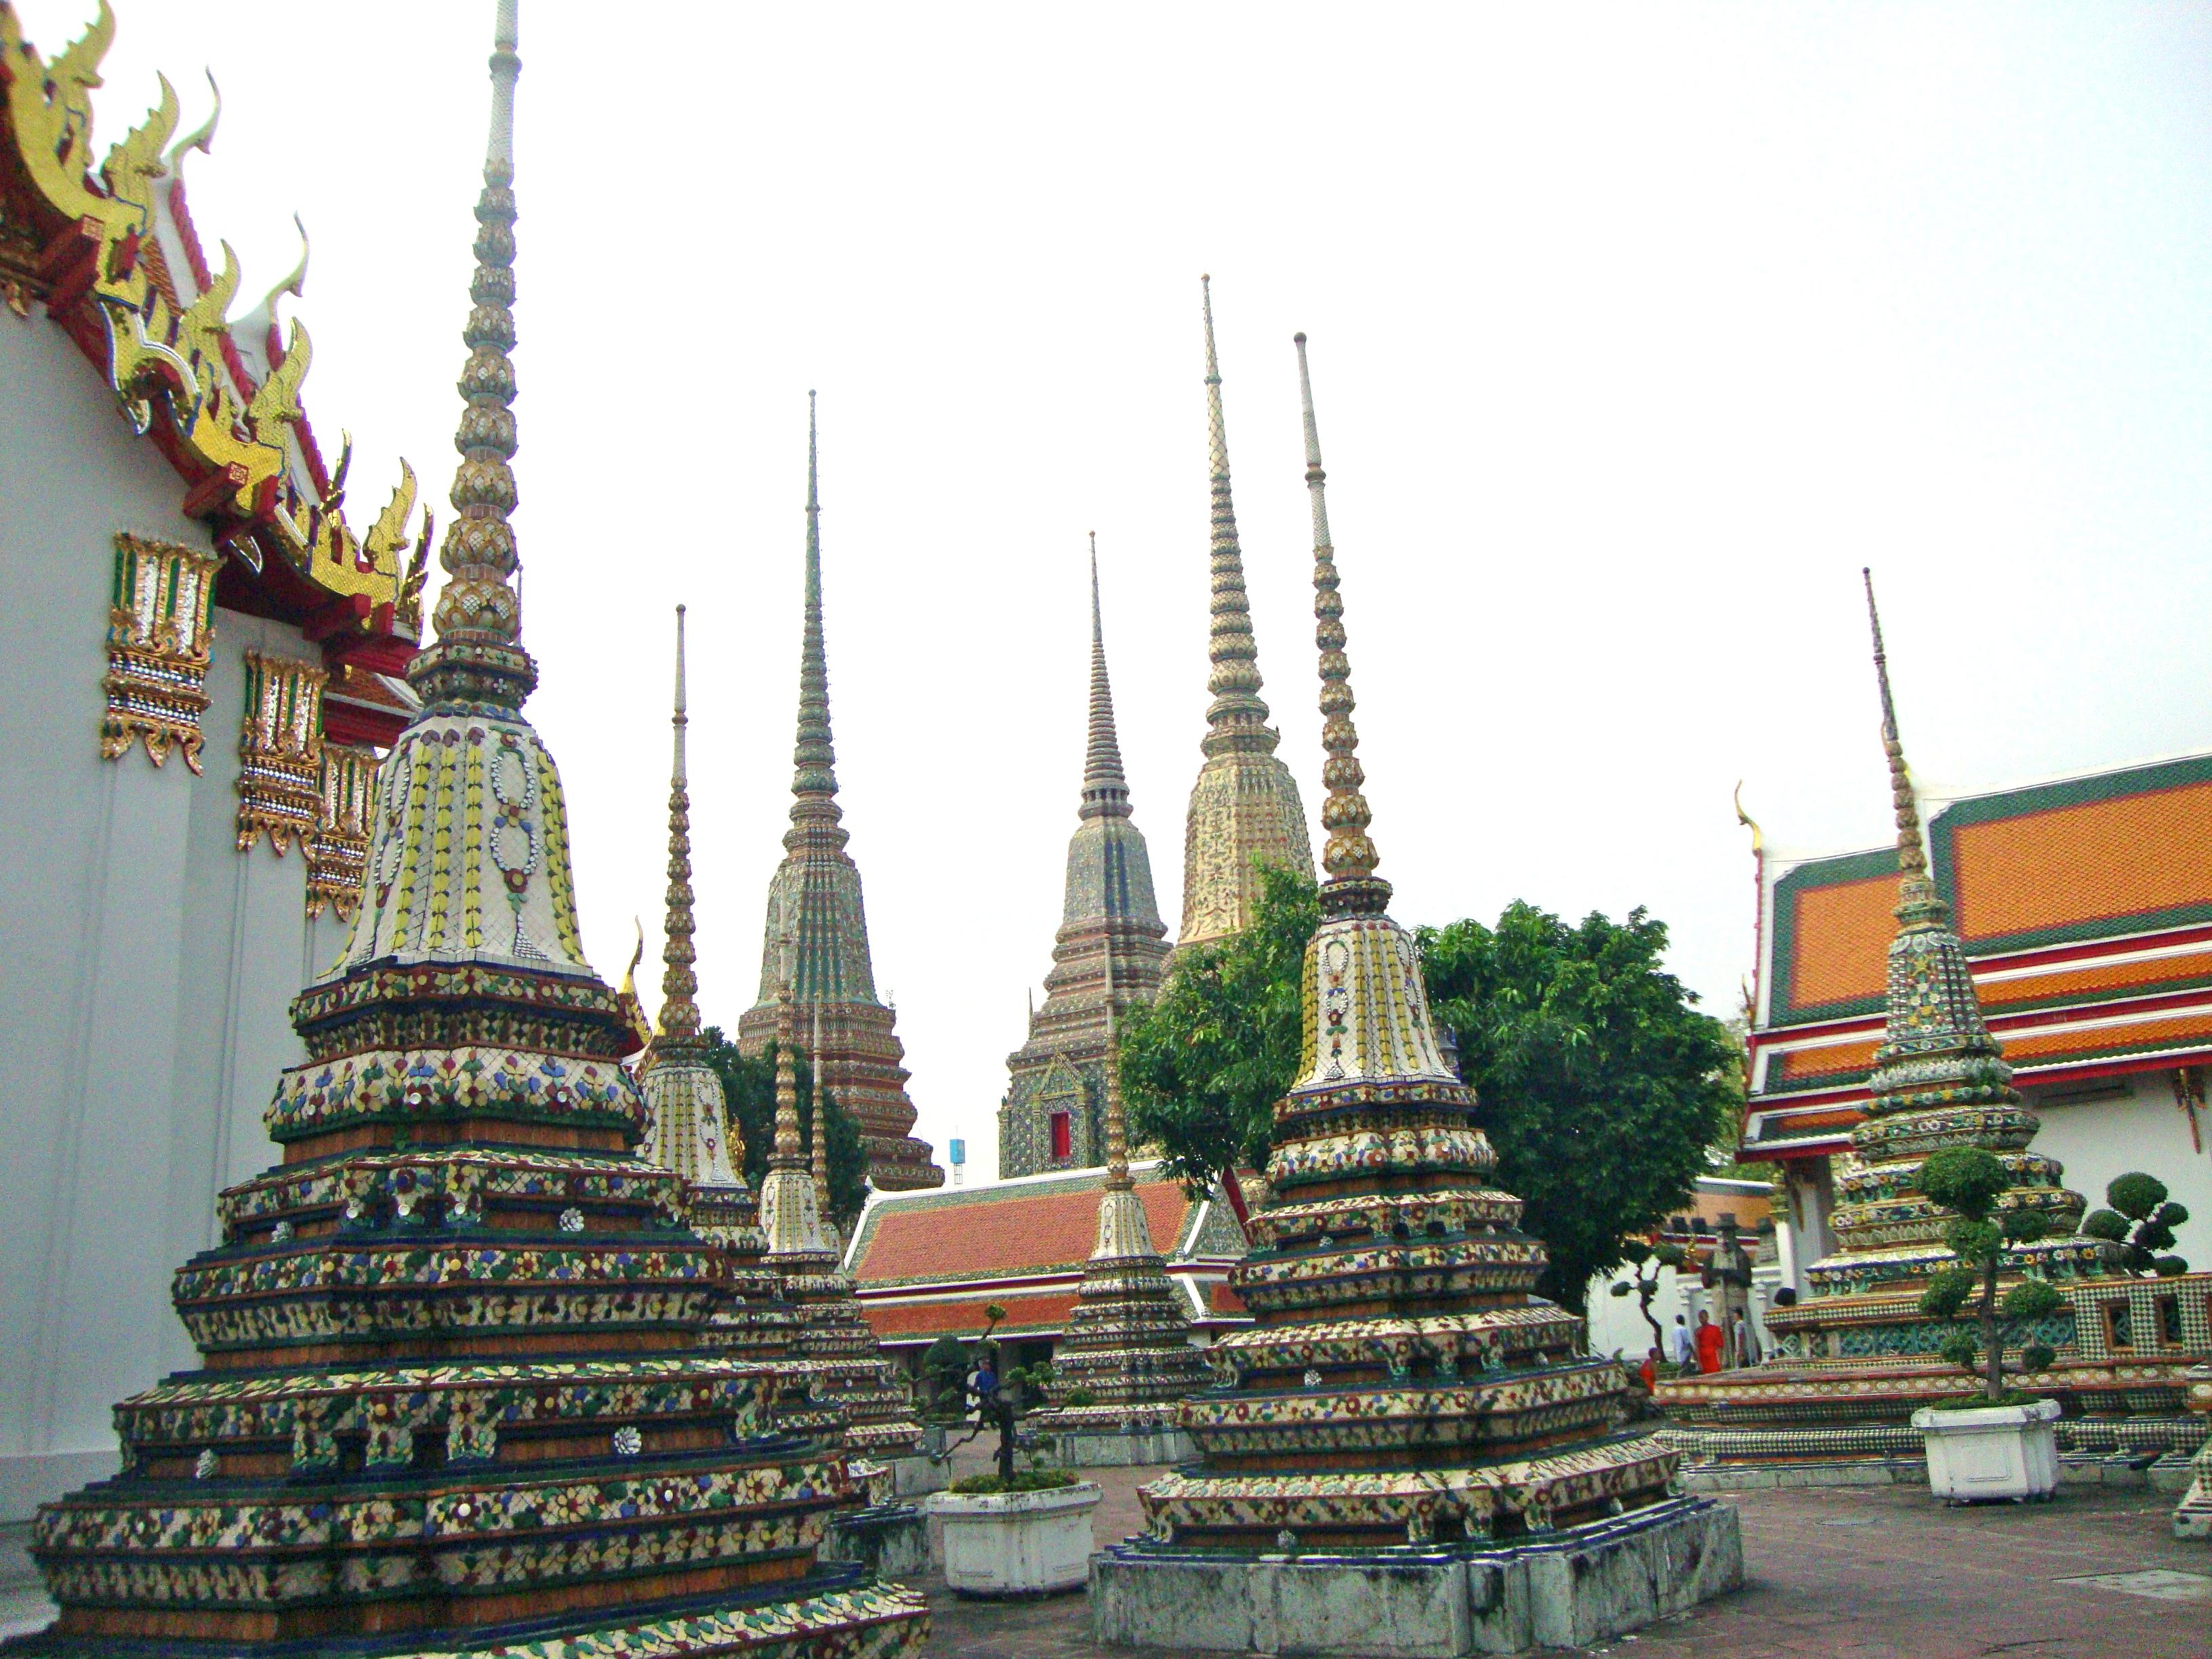 Description Burial Chambers Wat Pho Temple  8285845632  jpgWat Pho Temple